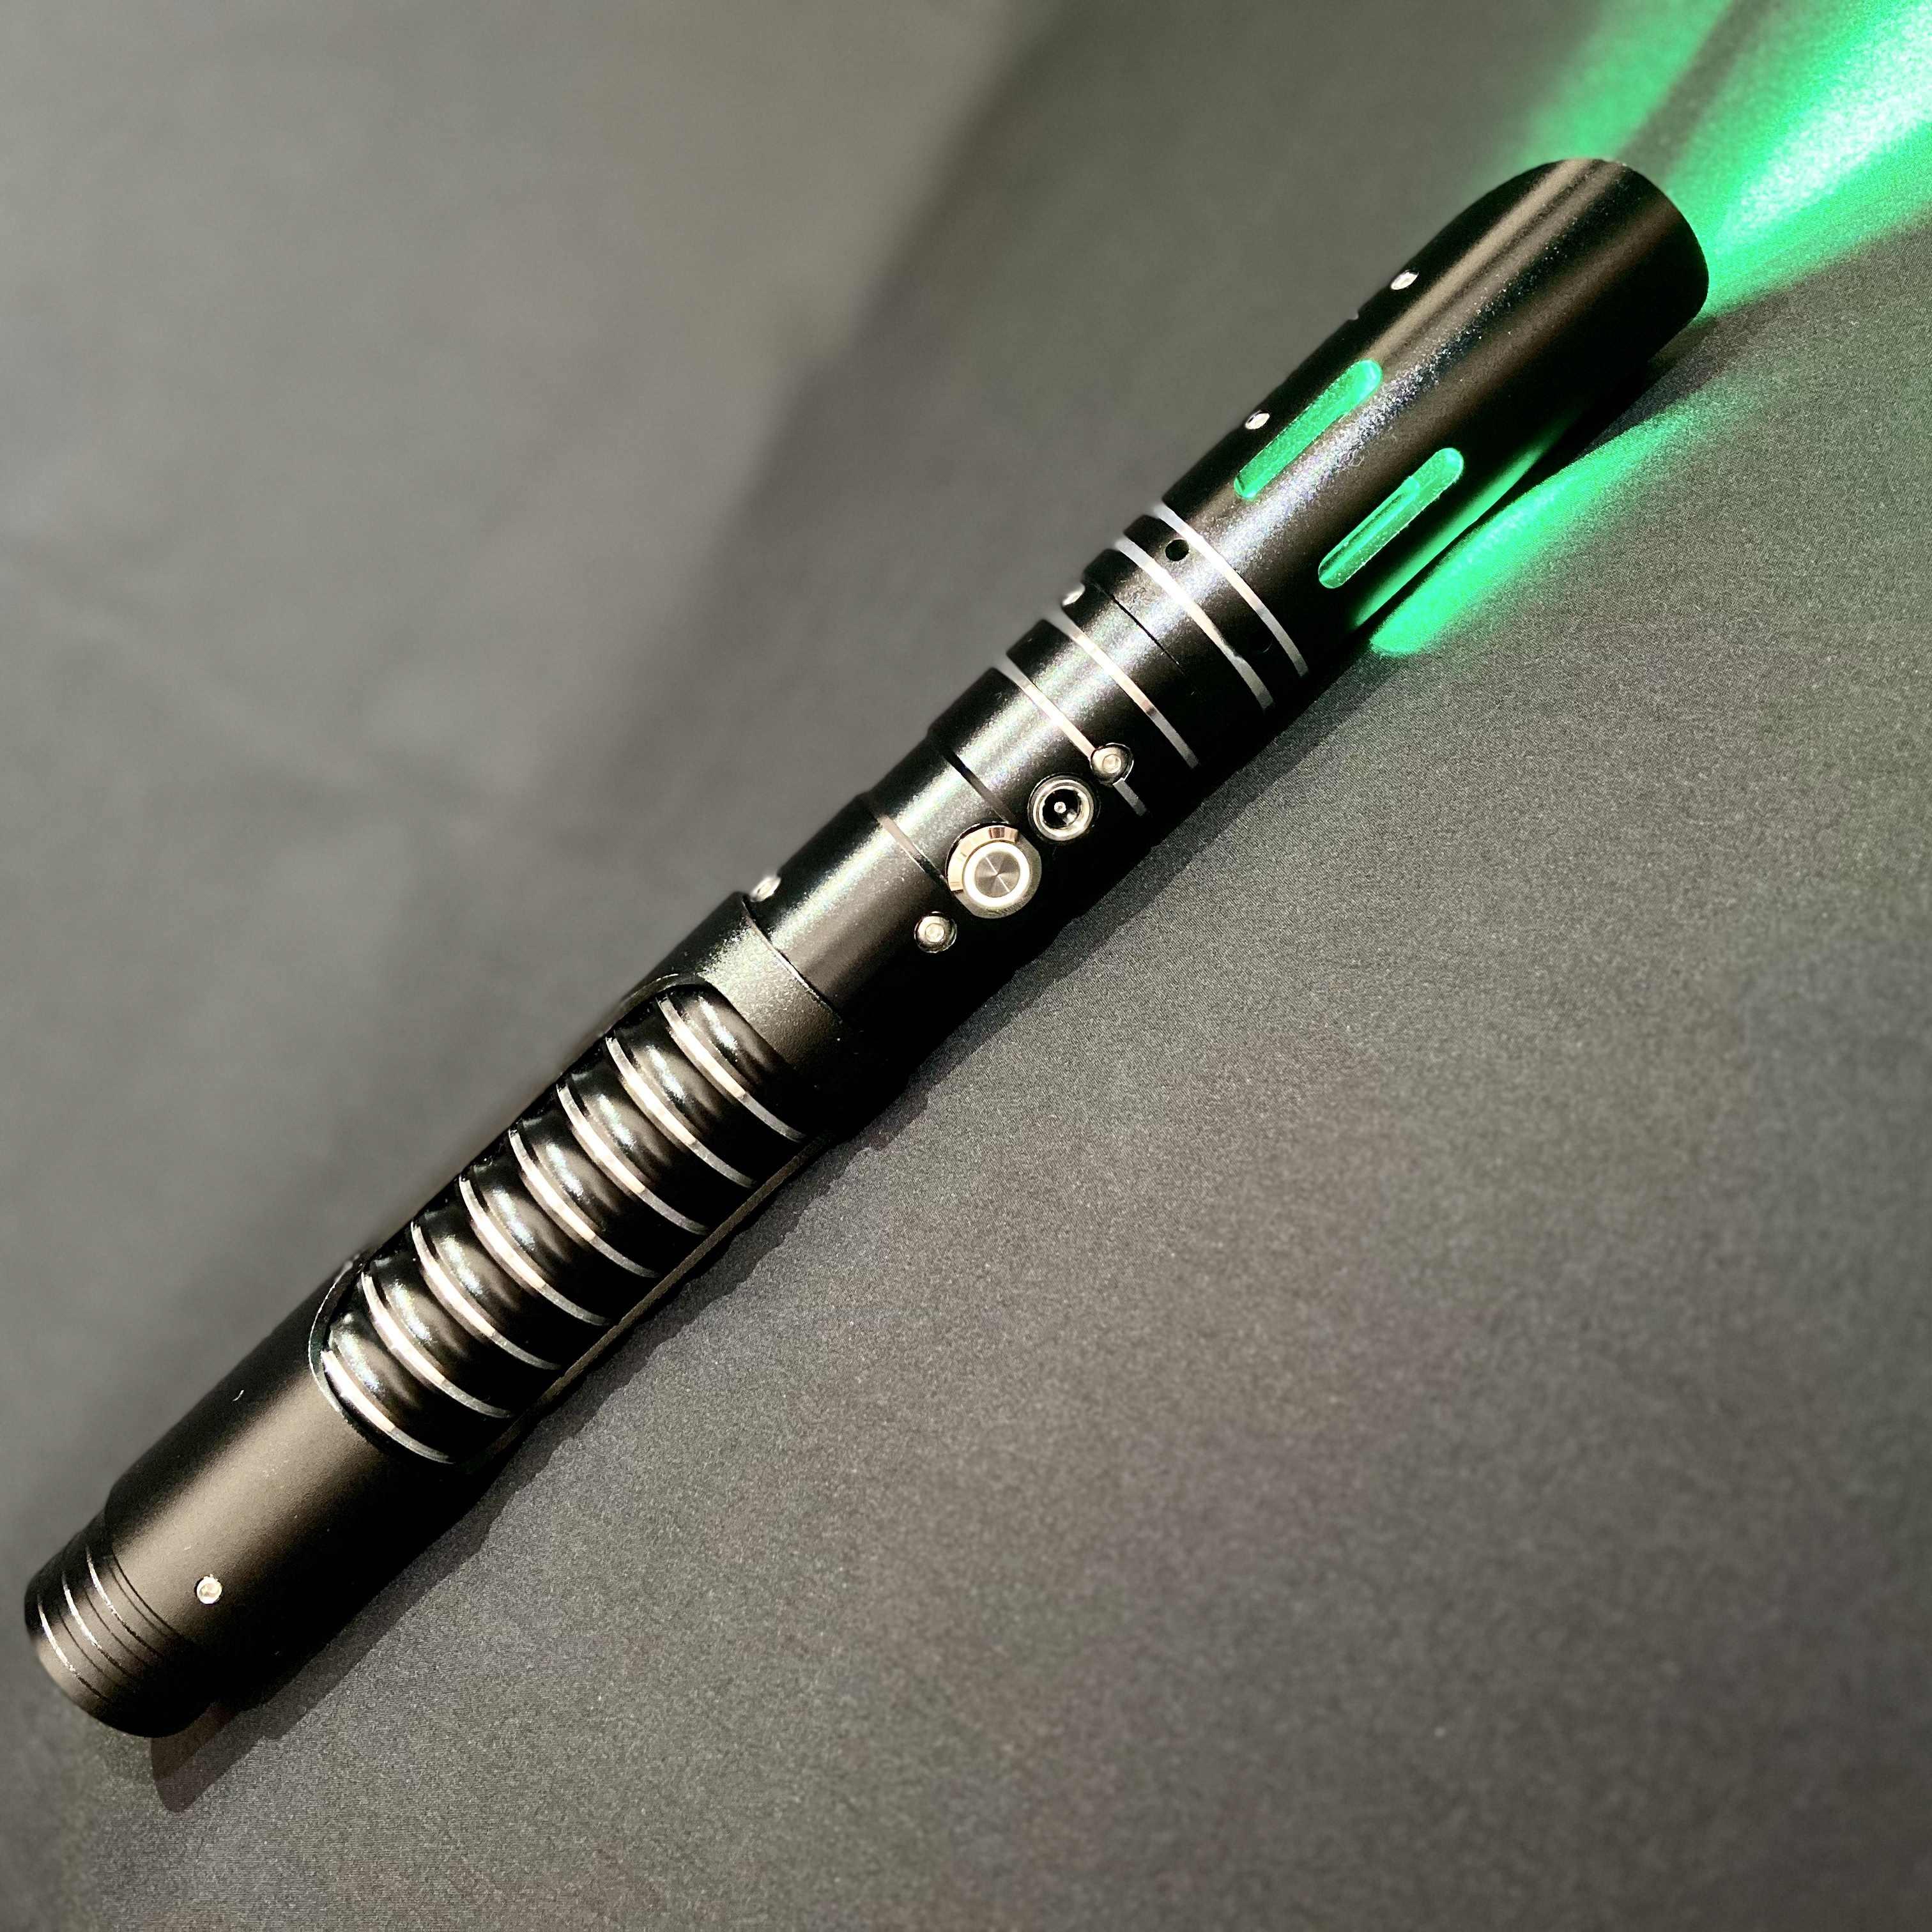 Txqsaber Cosplay Lightsaber dengan Lampu Suara LED Merah Hijau Biru Saber Laser Pedang Mainan Bintang Ulang Tahun Anak Hadiah Permainan